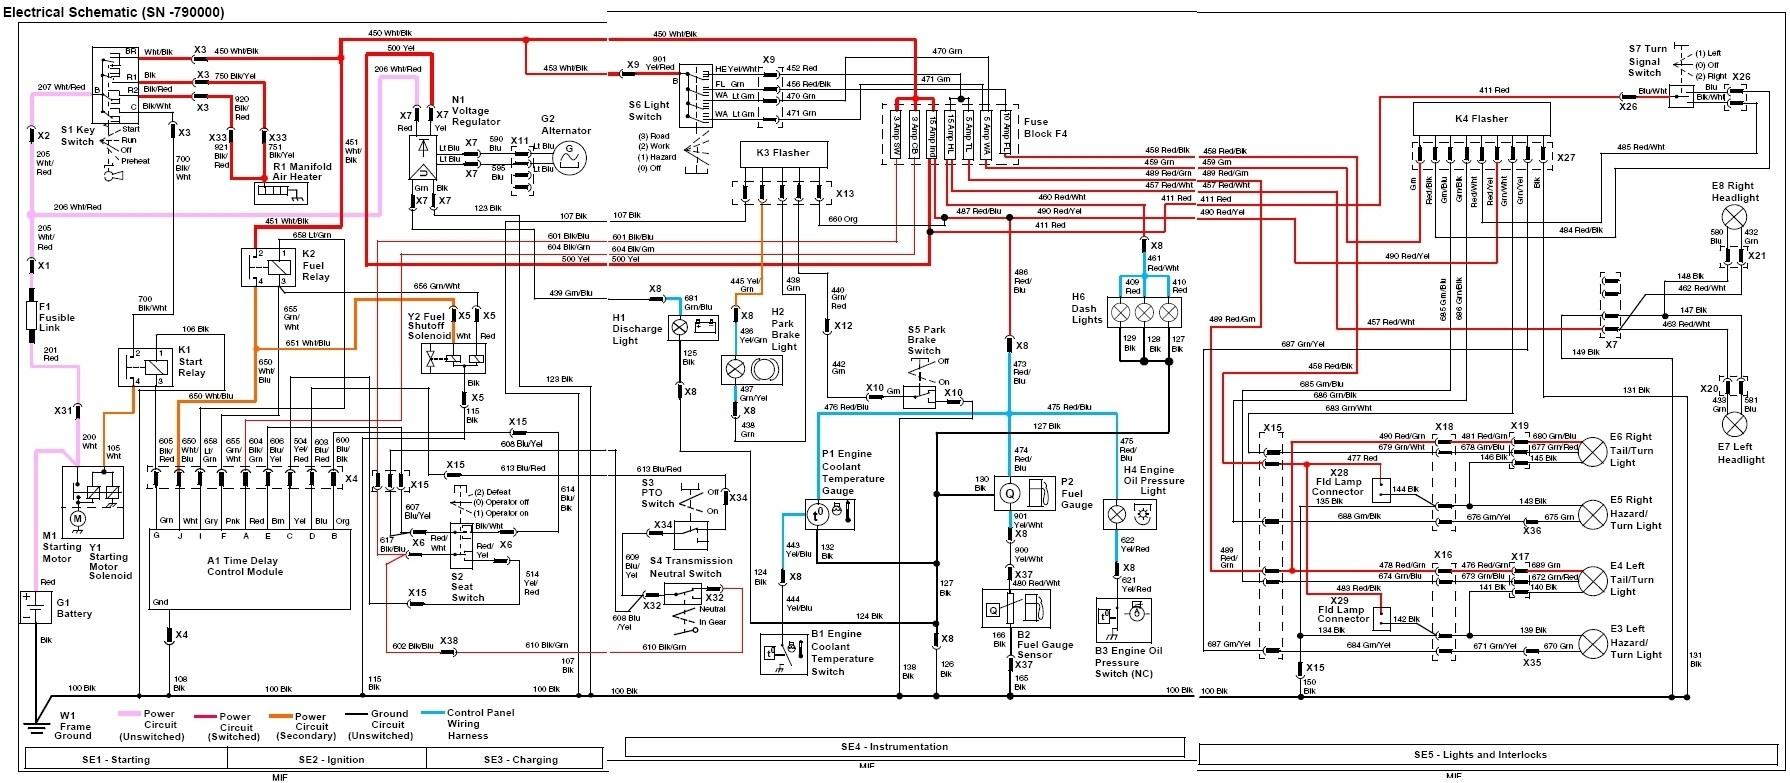 l100 wiring diagram - 2004 toyota tundra stereo wiring diagram for wiring  diagram schematics  wiring diagram schematics